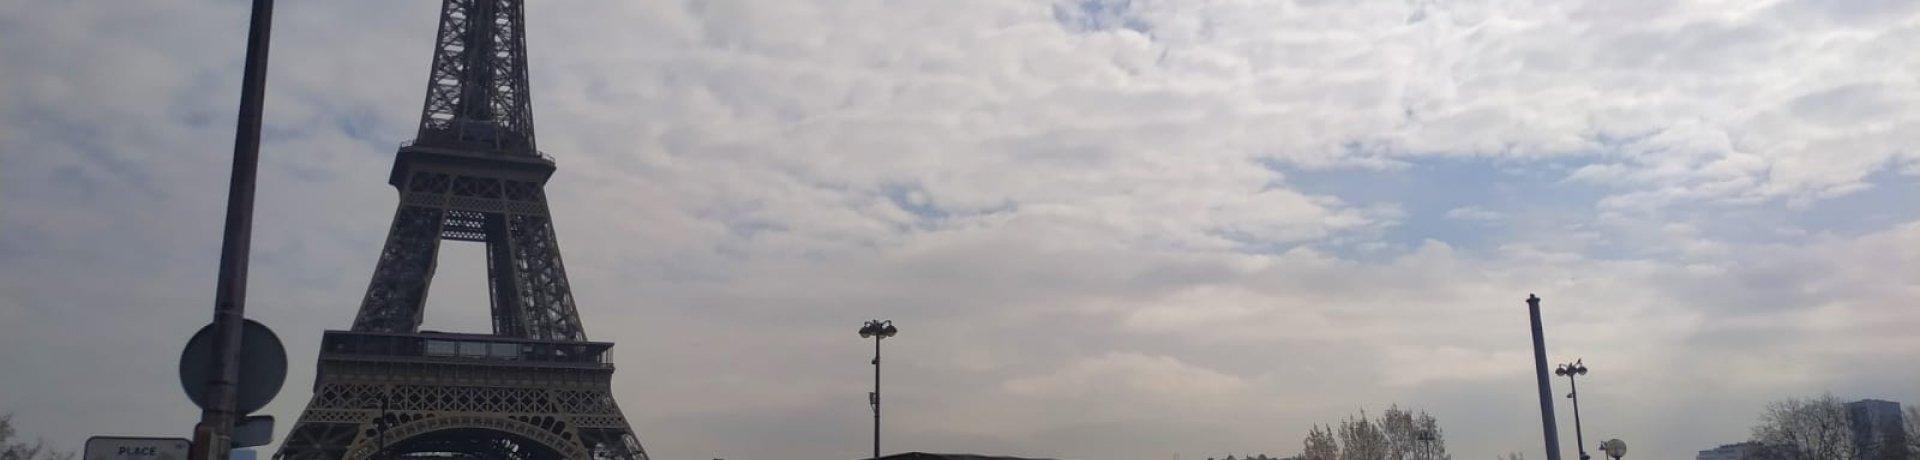 Zebra Autotrasporti Francia 1